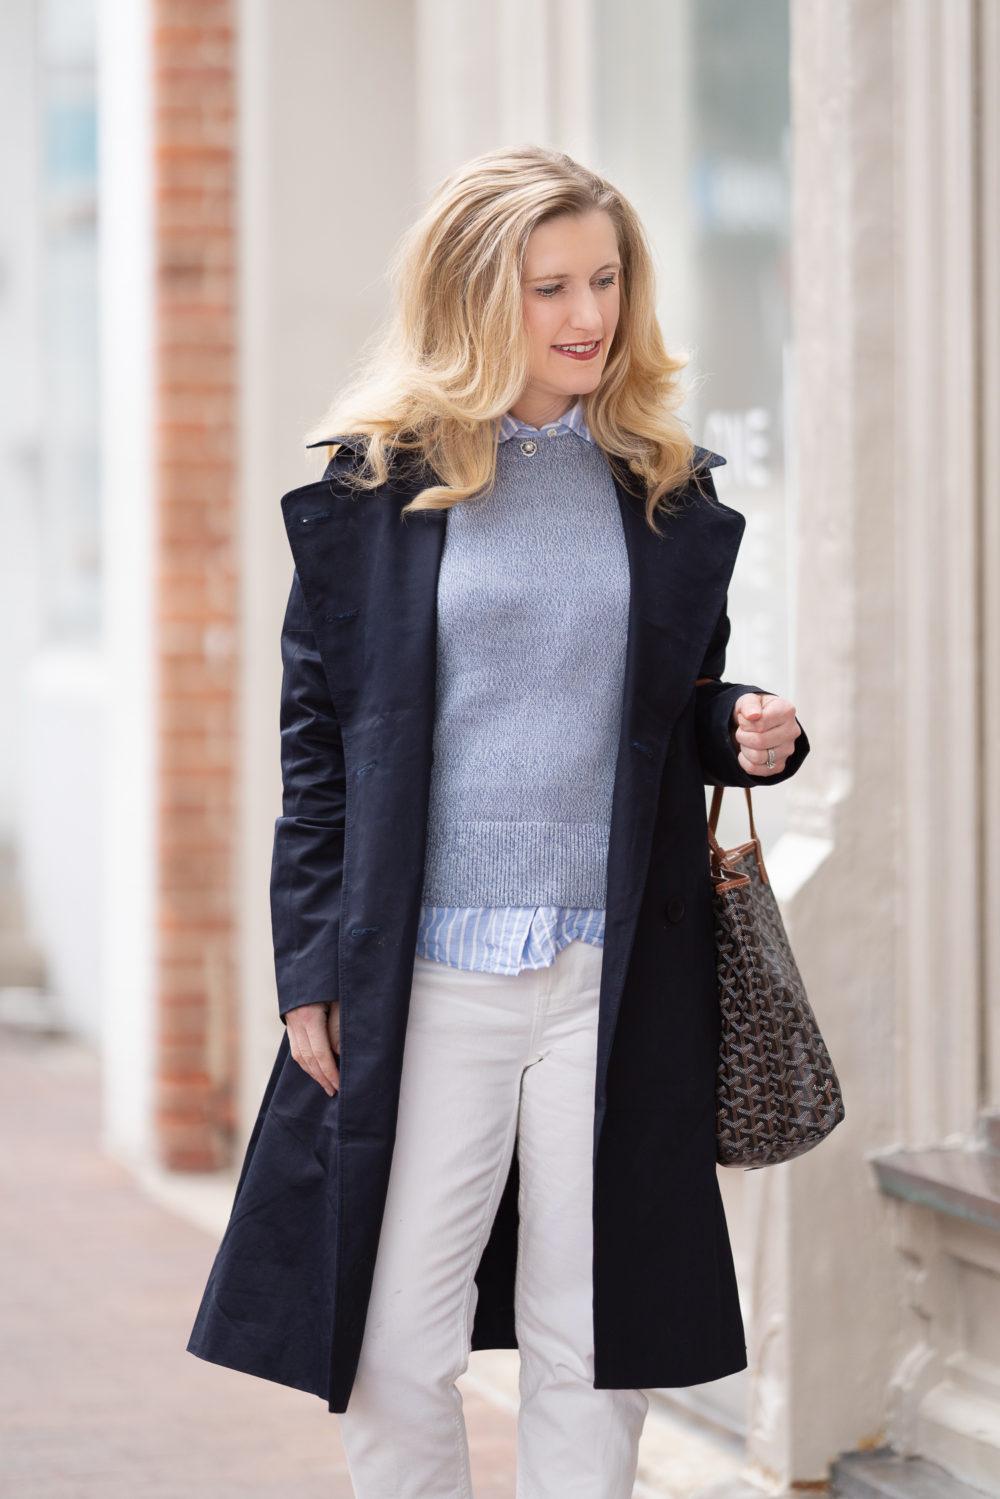 Petite Fashion Blog | Everlane Drape Trench Coat | Everlane Soft Cotton Crew | Everlane Cheeky Straight Jean | Everlane Day Heel